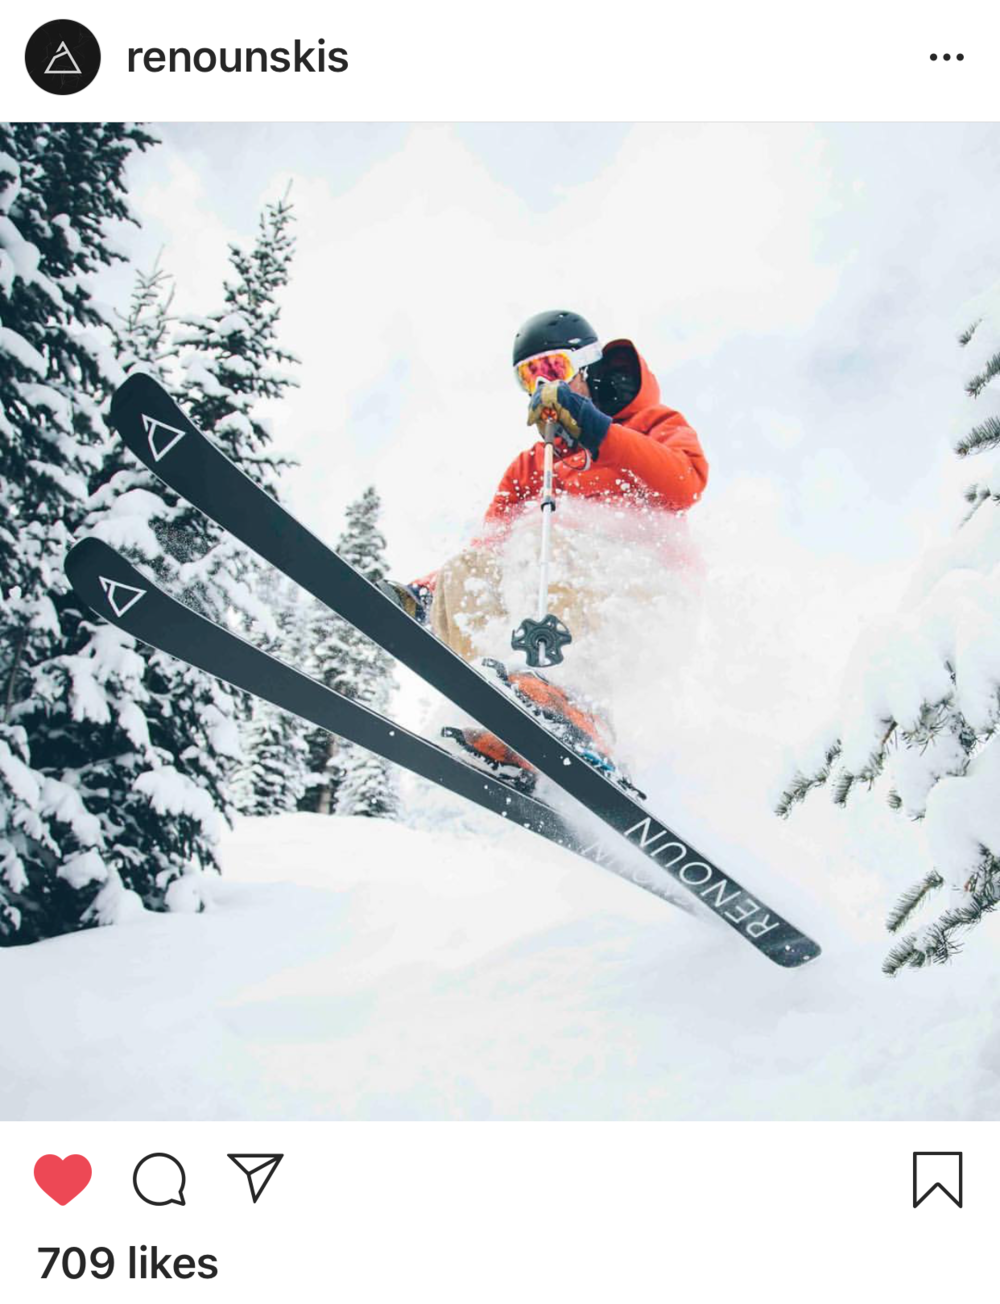 Renoun Skis: Added 25,000 Followers